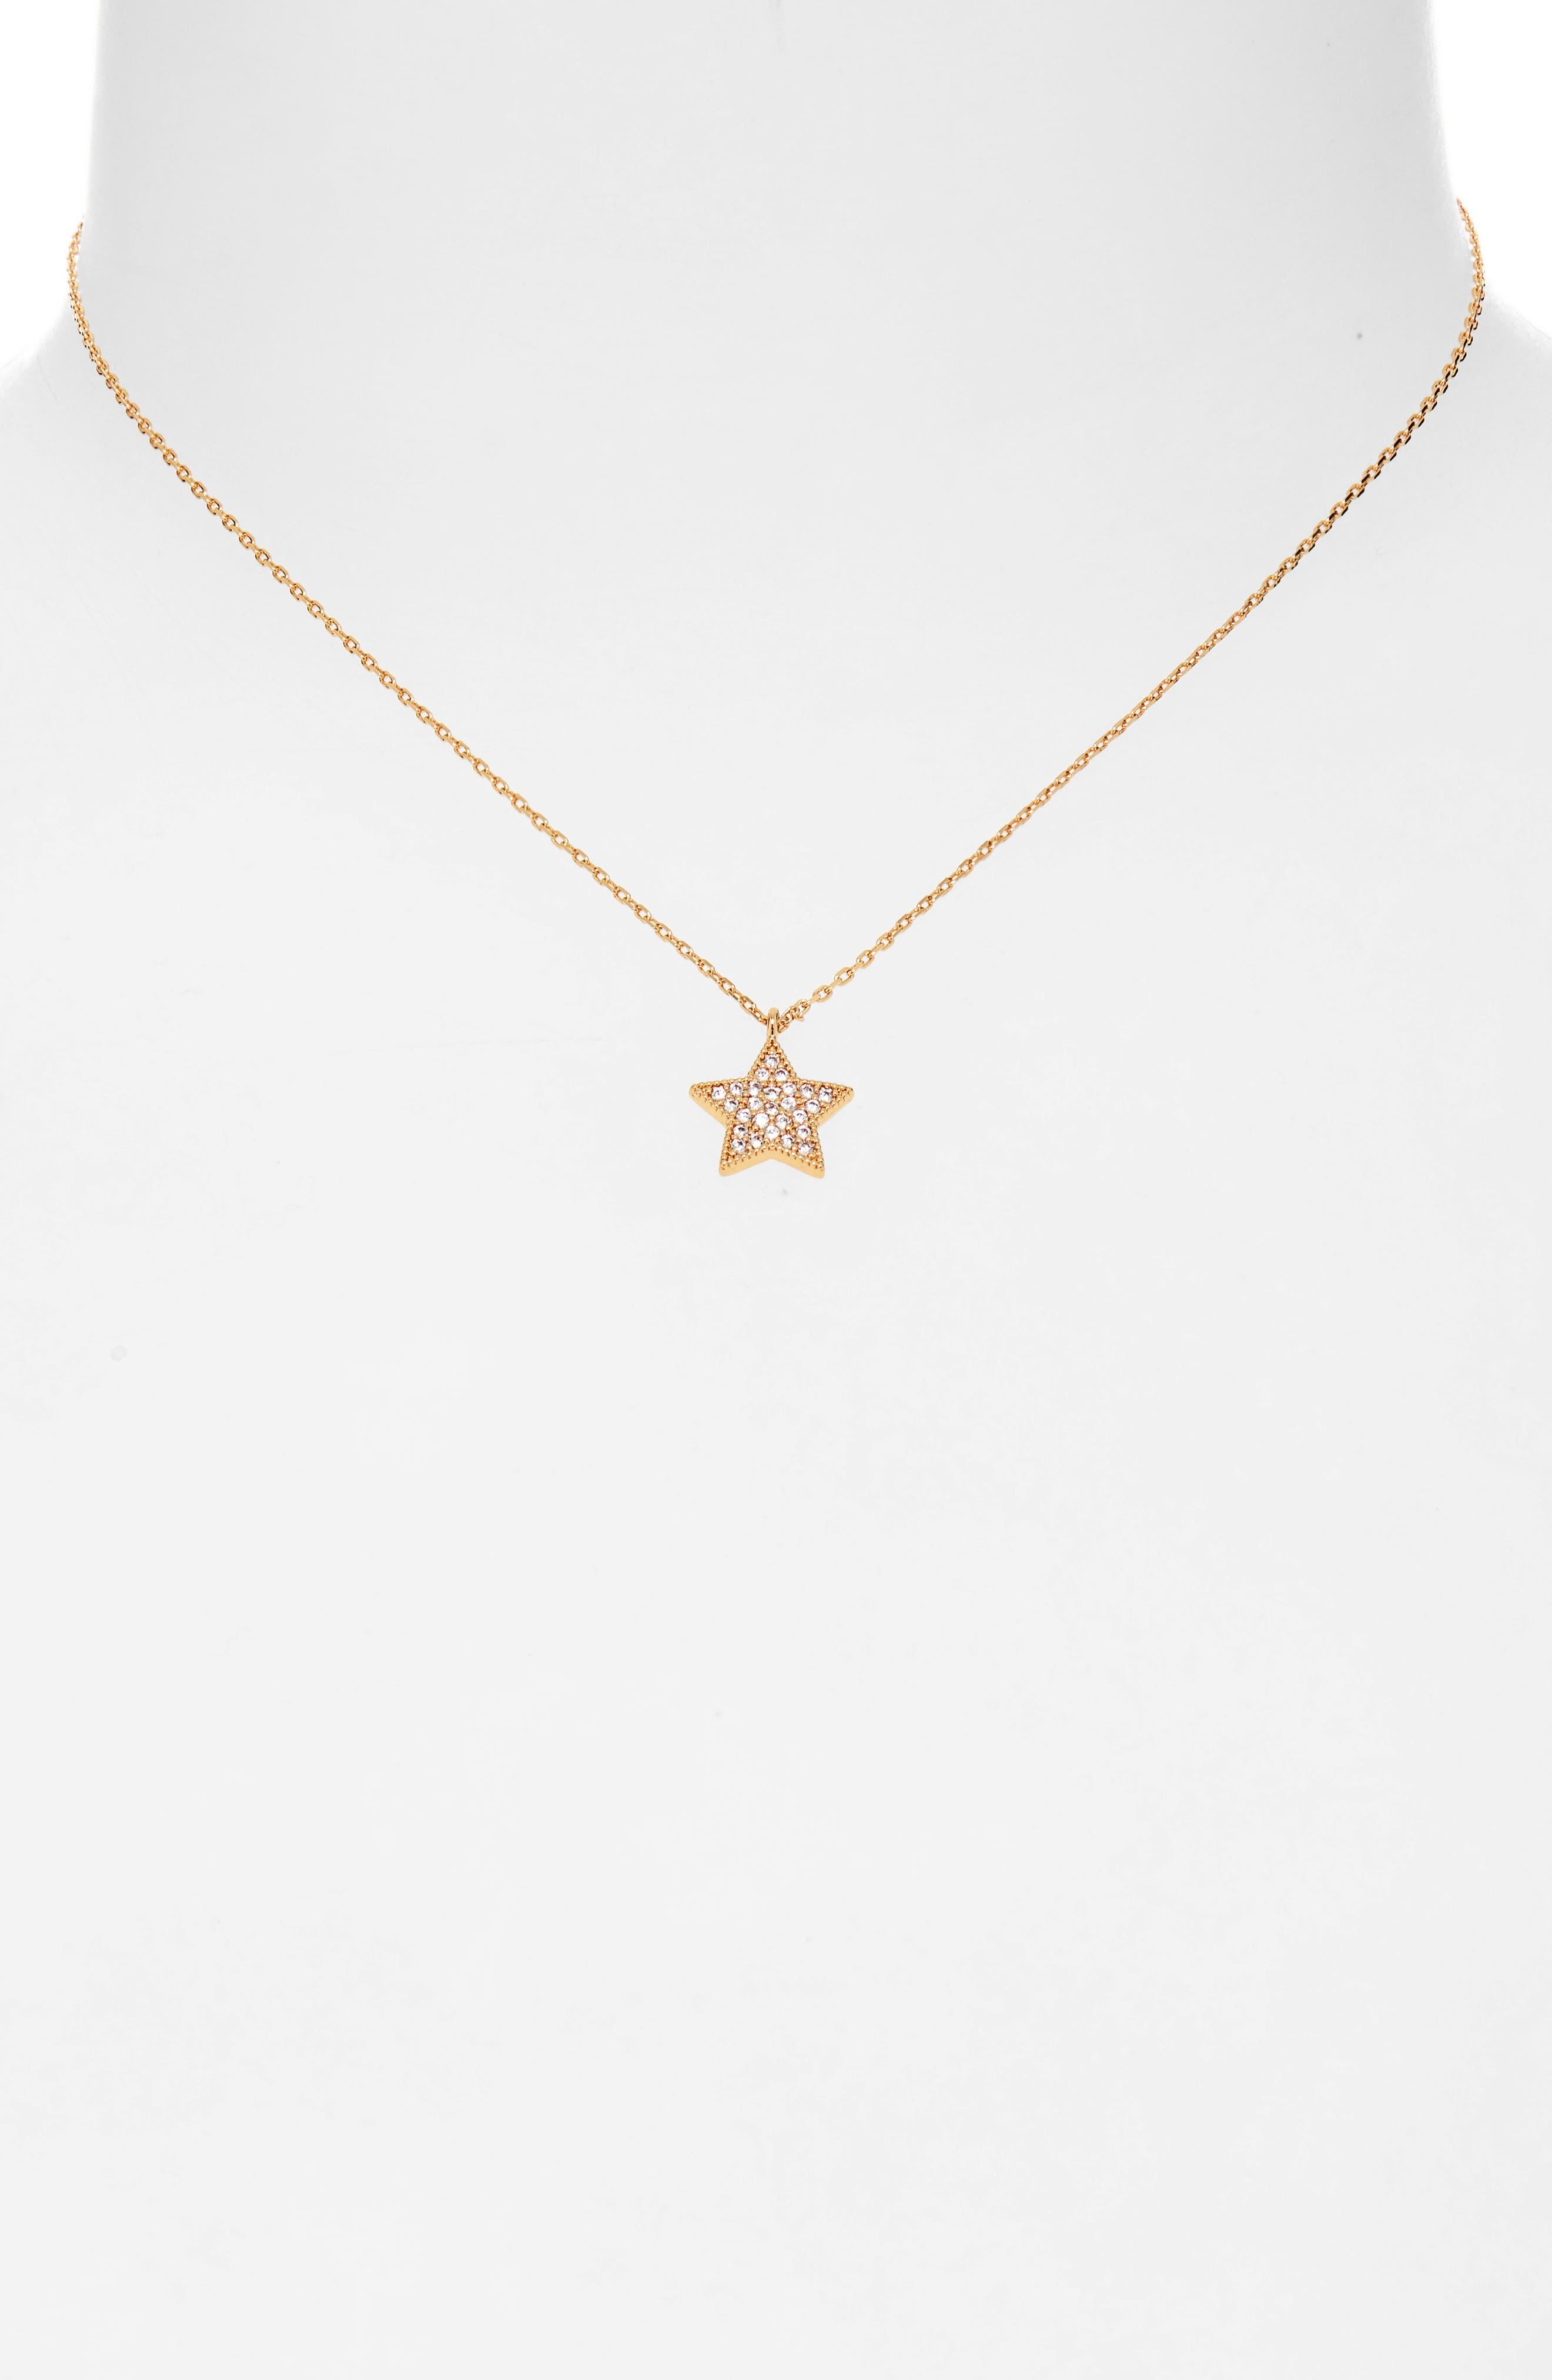 UNCOMMON JAMES BY KRISTIN CAVALLARI, Big Star Pendant Necklace, Alternate thumbnail 2, color, GOLD